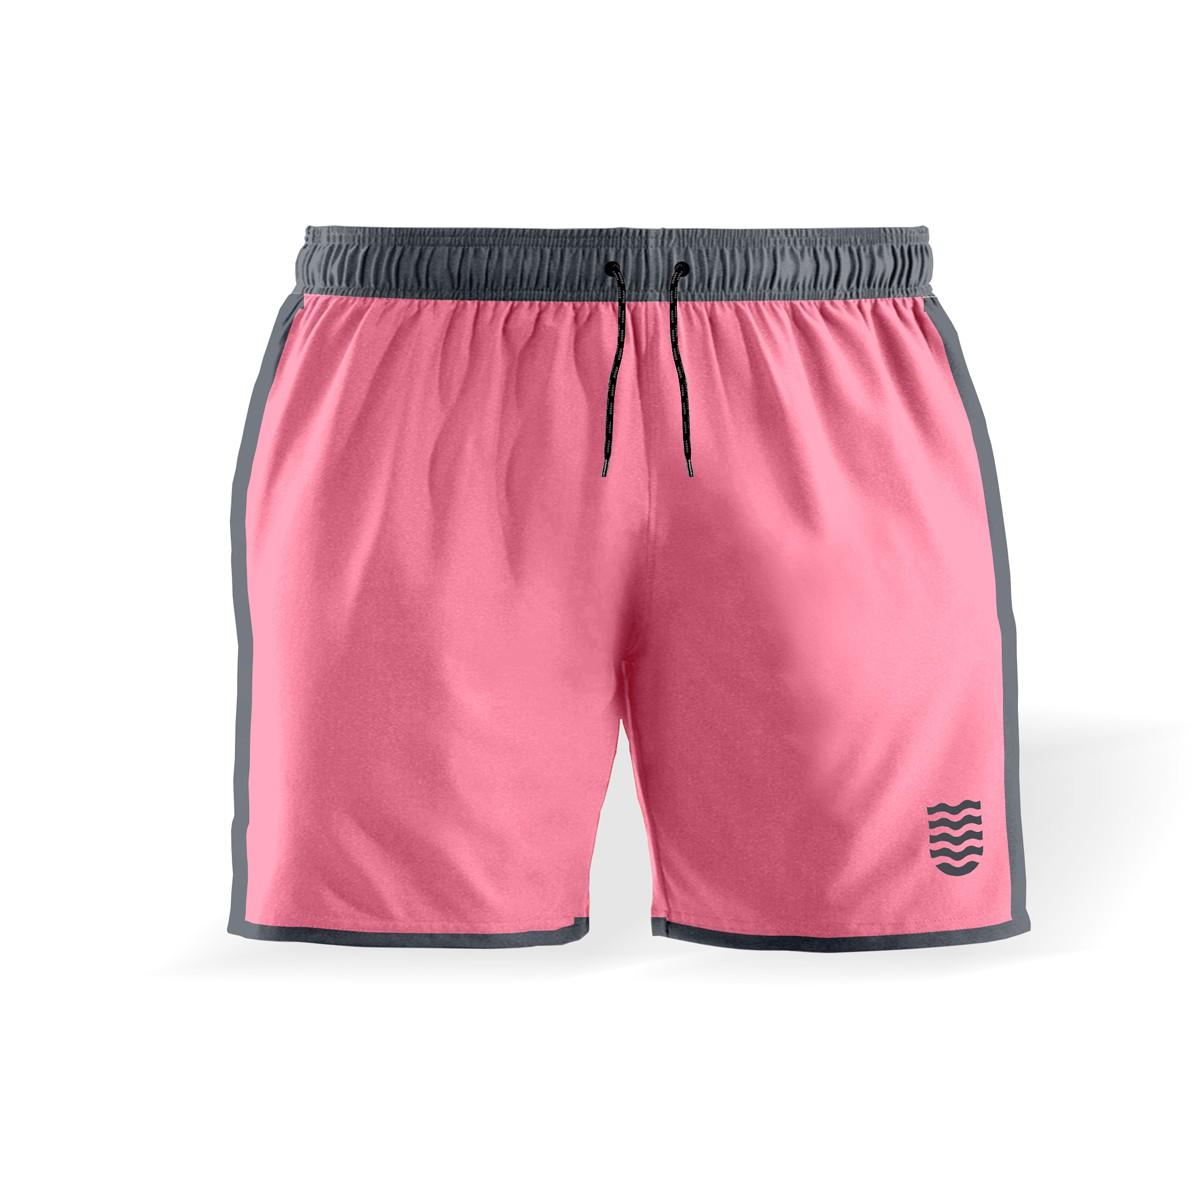 Shorts Masculino Wss Colors DeepPink